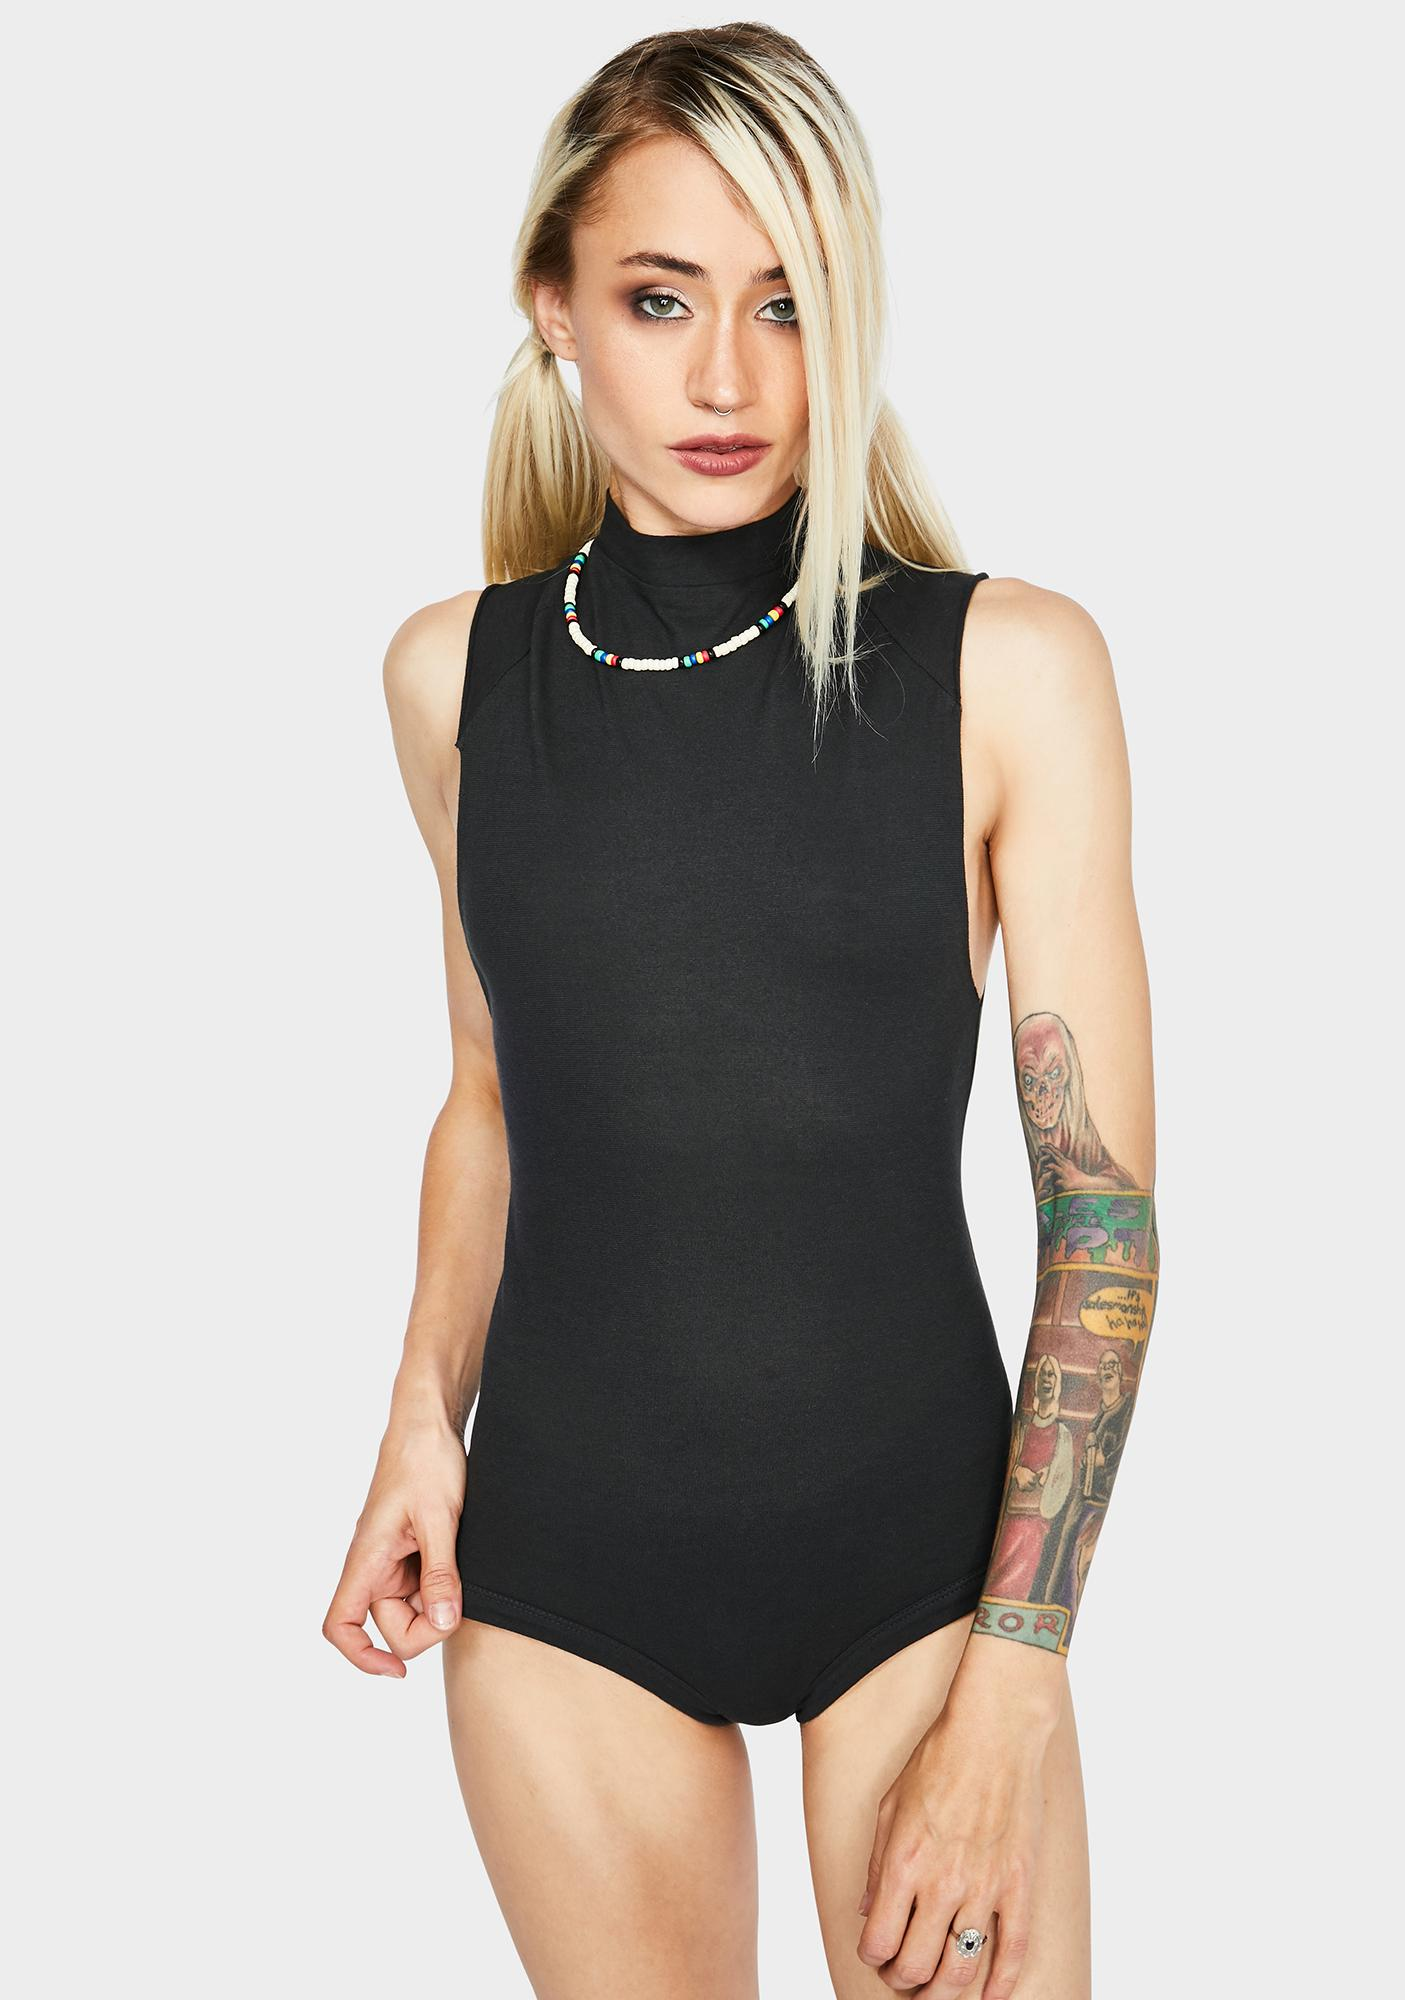 Free People Black Muscle Beach Bodysuit